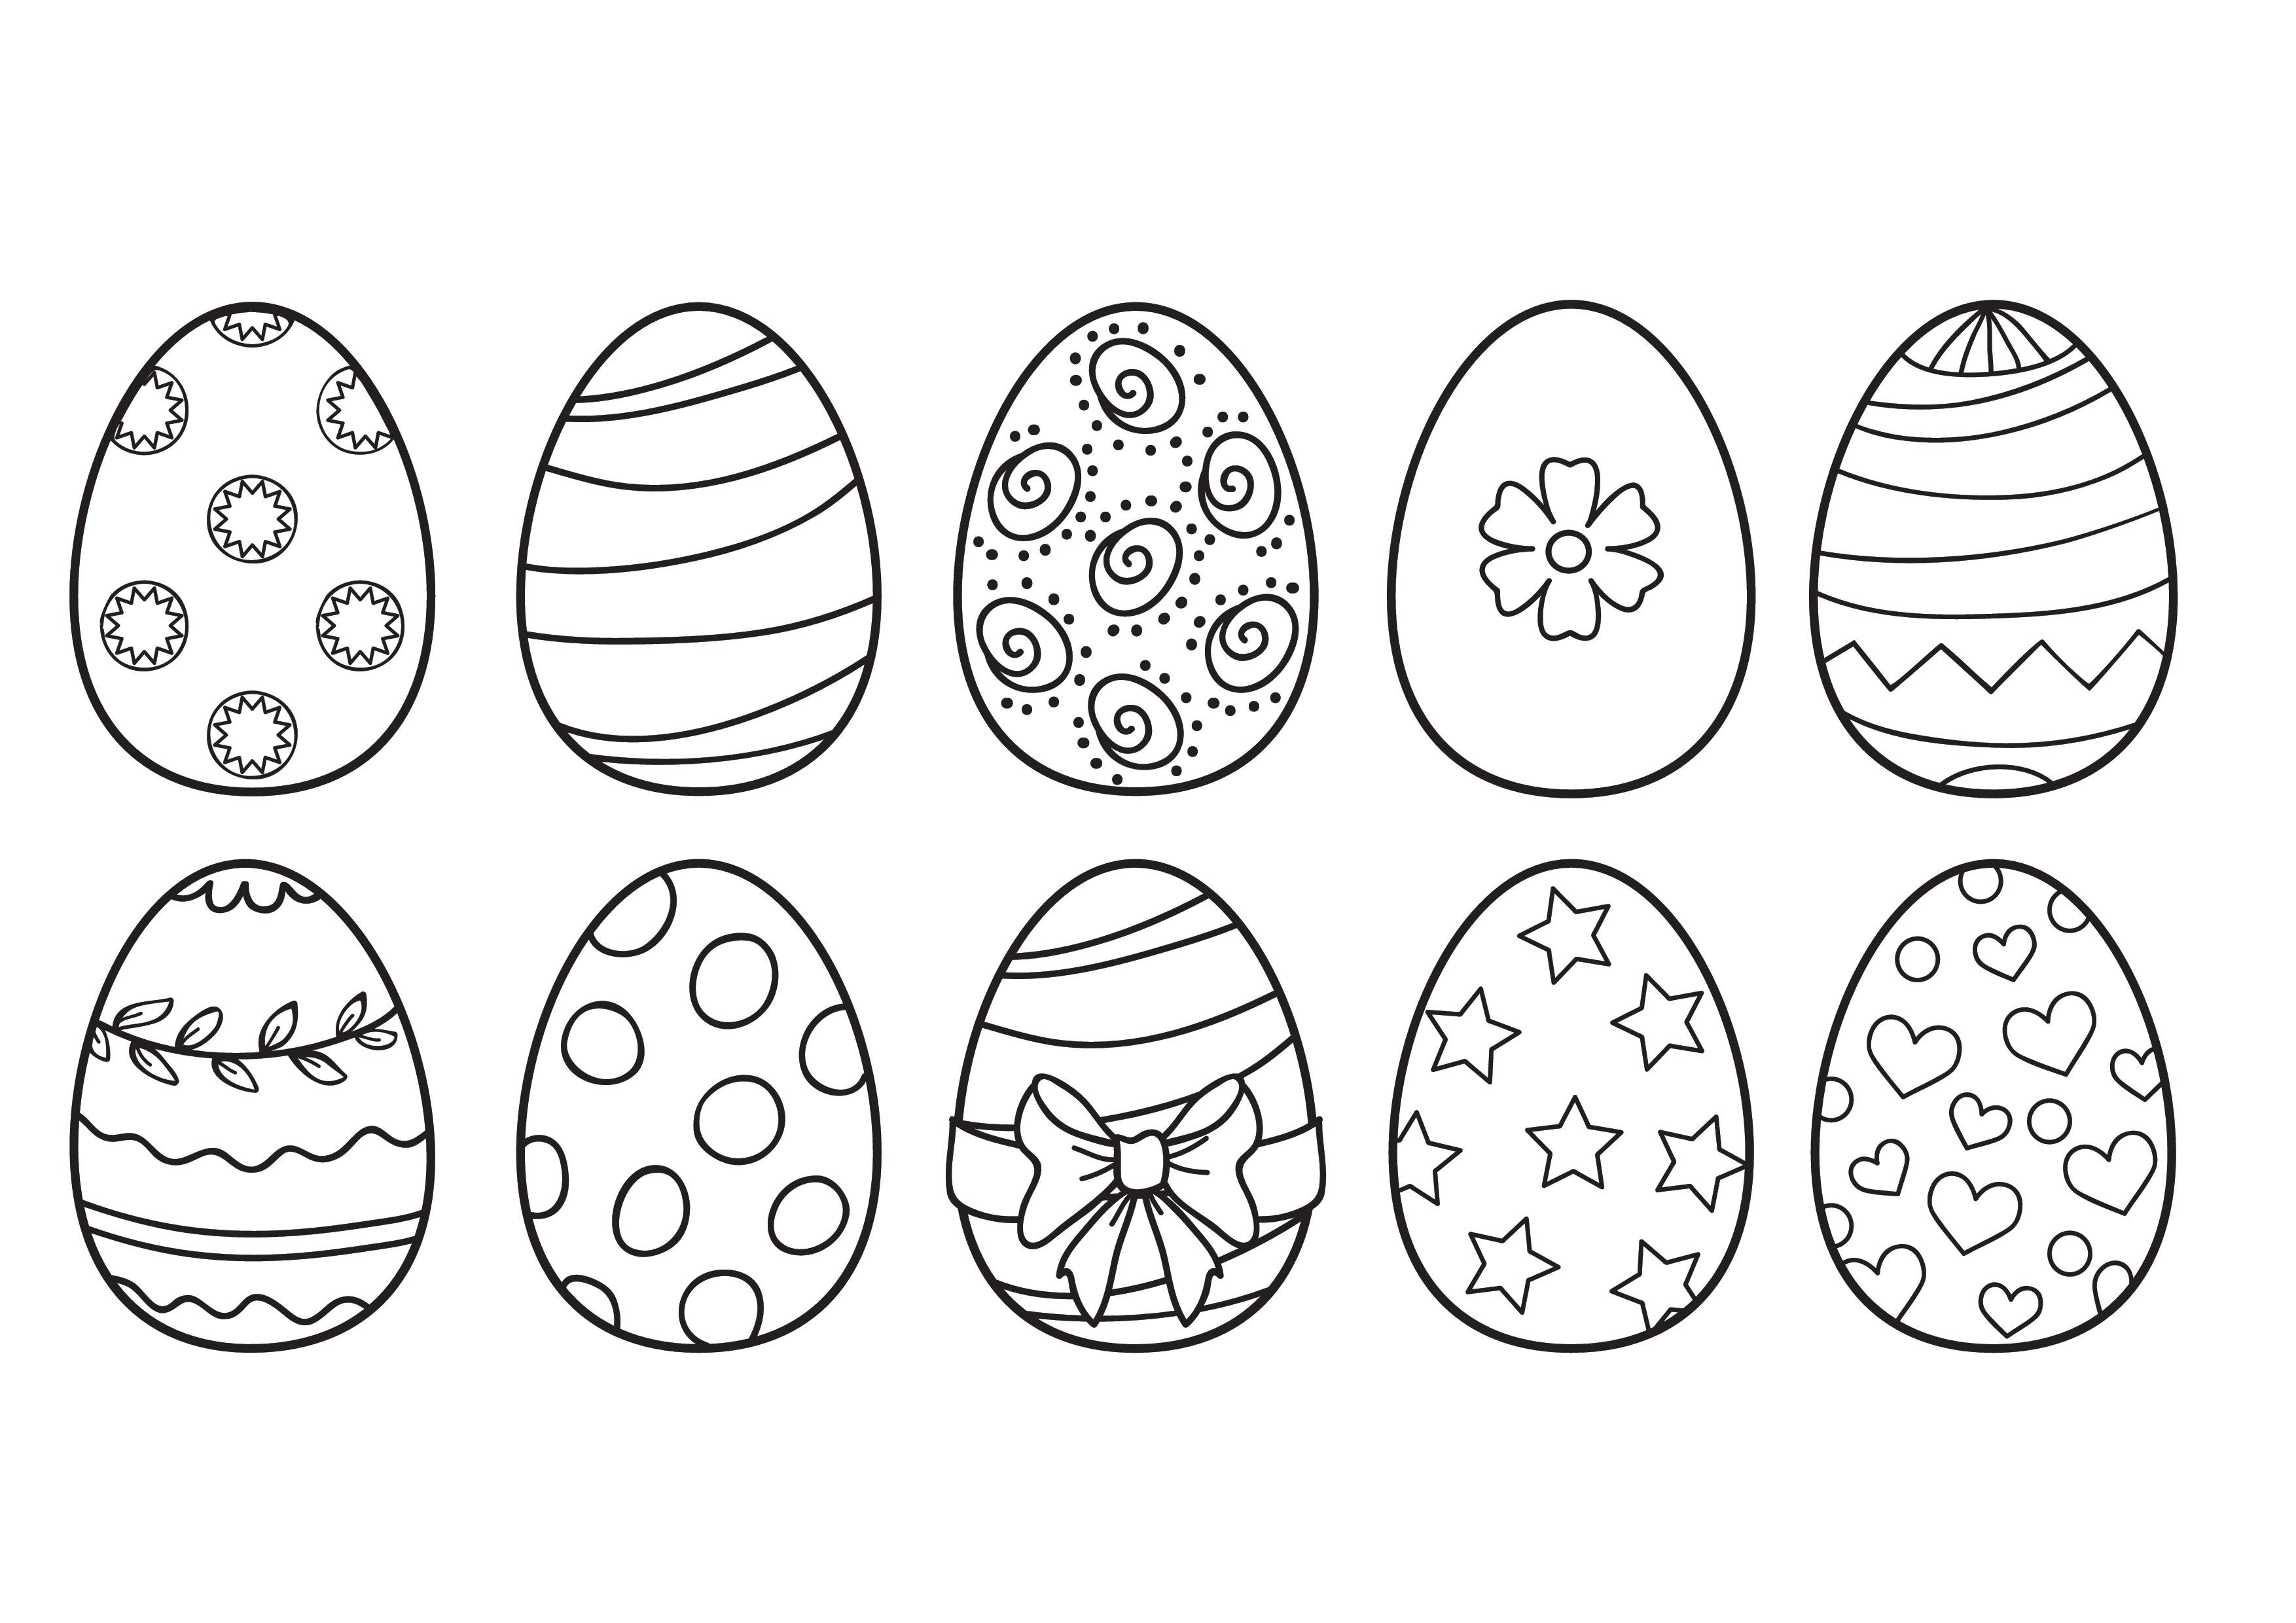 Dibujos de huevos de Pascua para colorear   Hogarmania